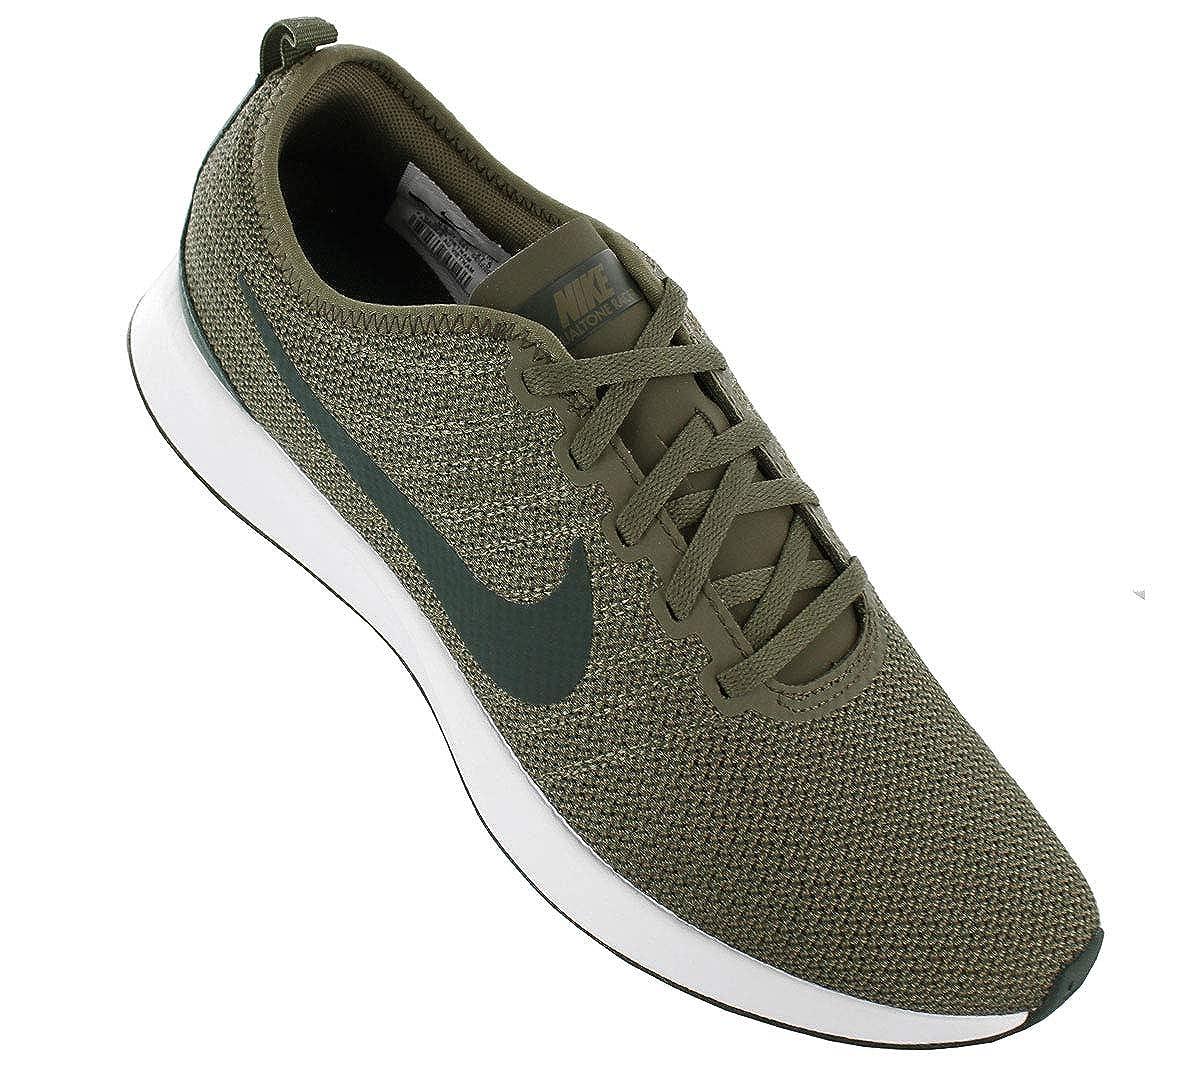 Olive Nike Dualtone Racer Trainers